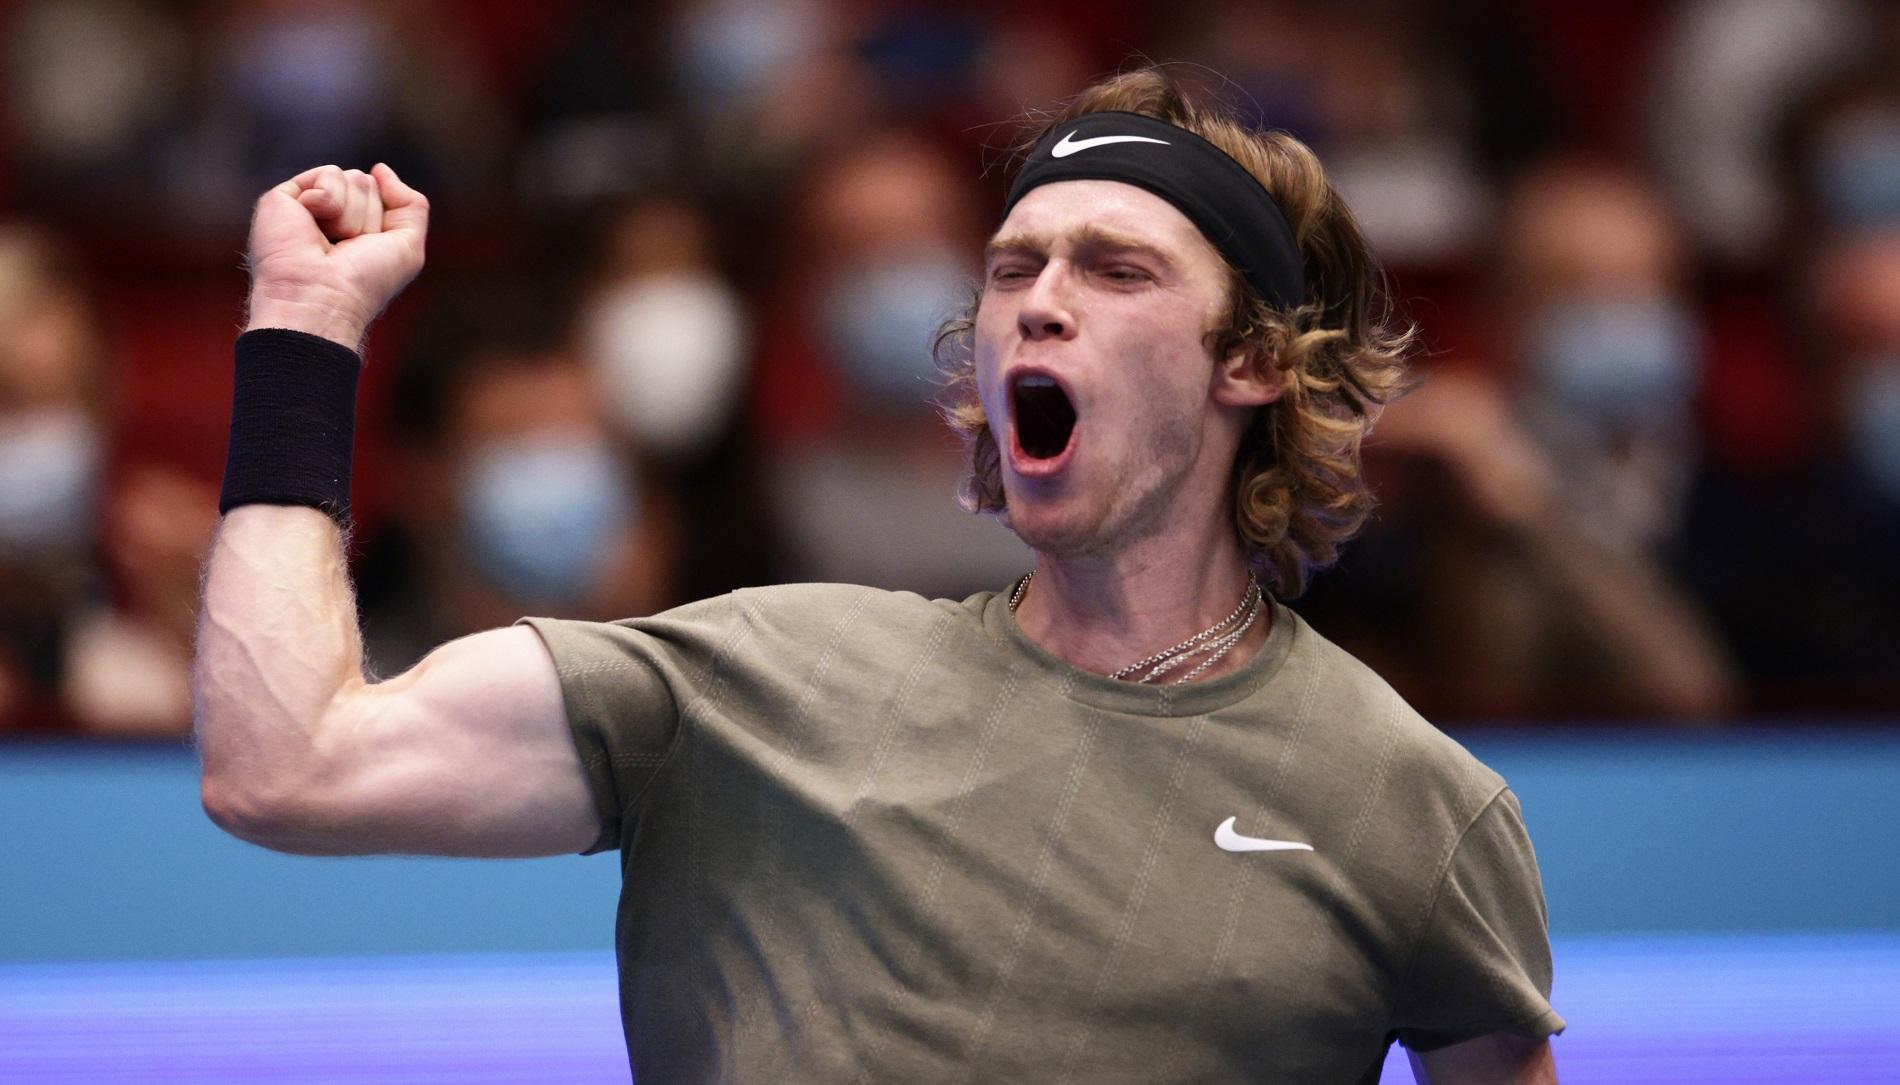 Qatar Open 2021: Andrey Rublev vs. Roberto Bautista Agut Tennis Preview and Prediction